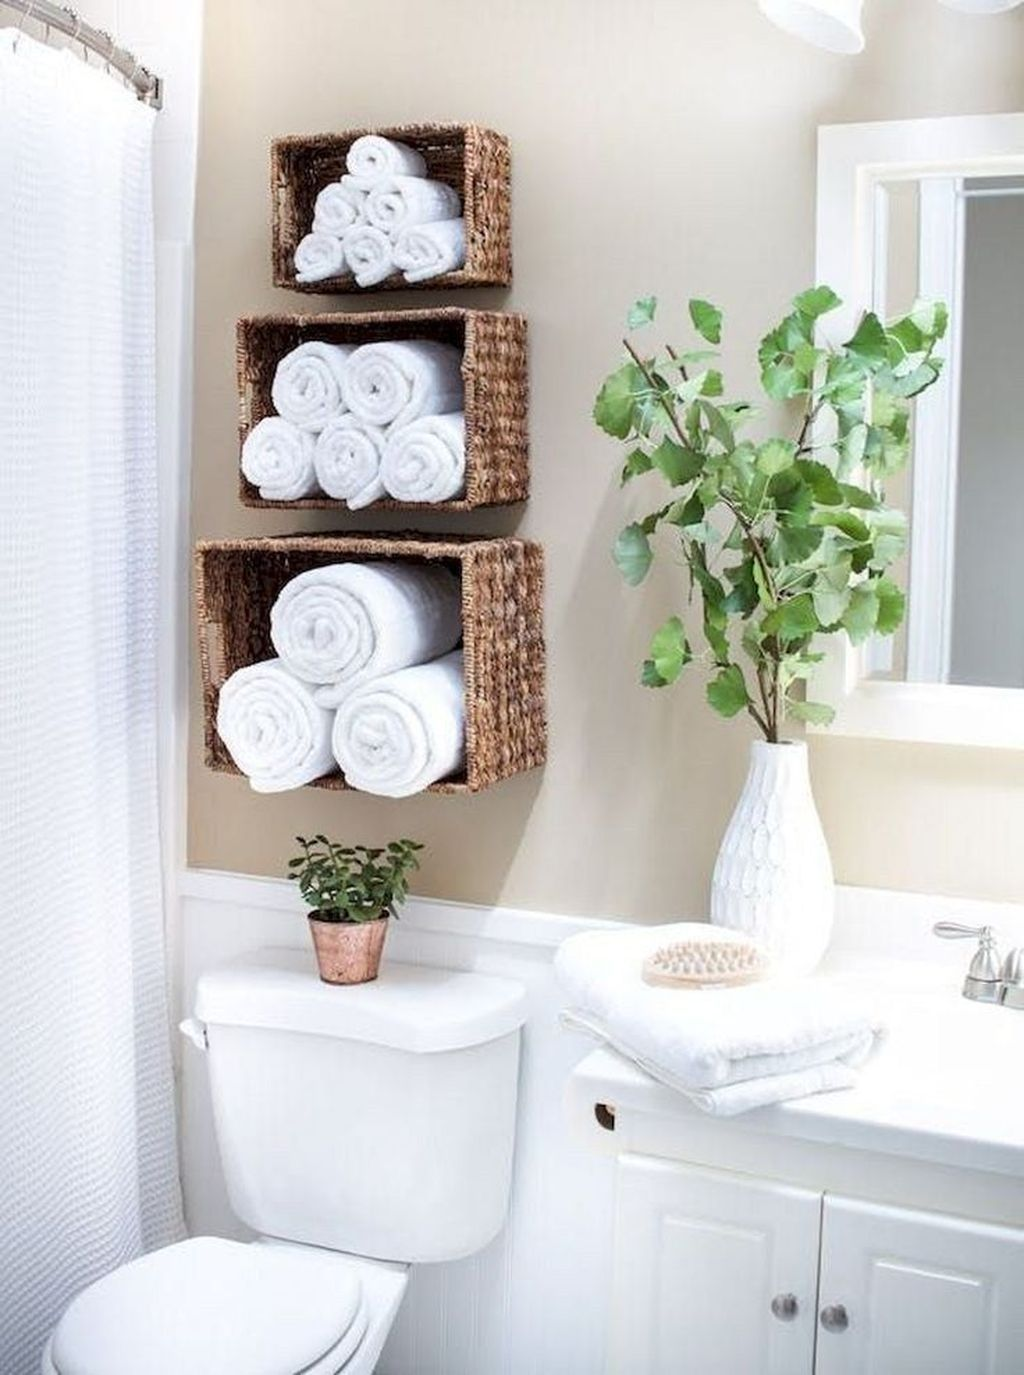 40 Cute Bathroom Decor Ideas To Make Your Look Fresher Small Diy Storage